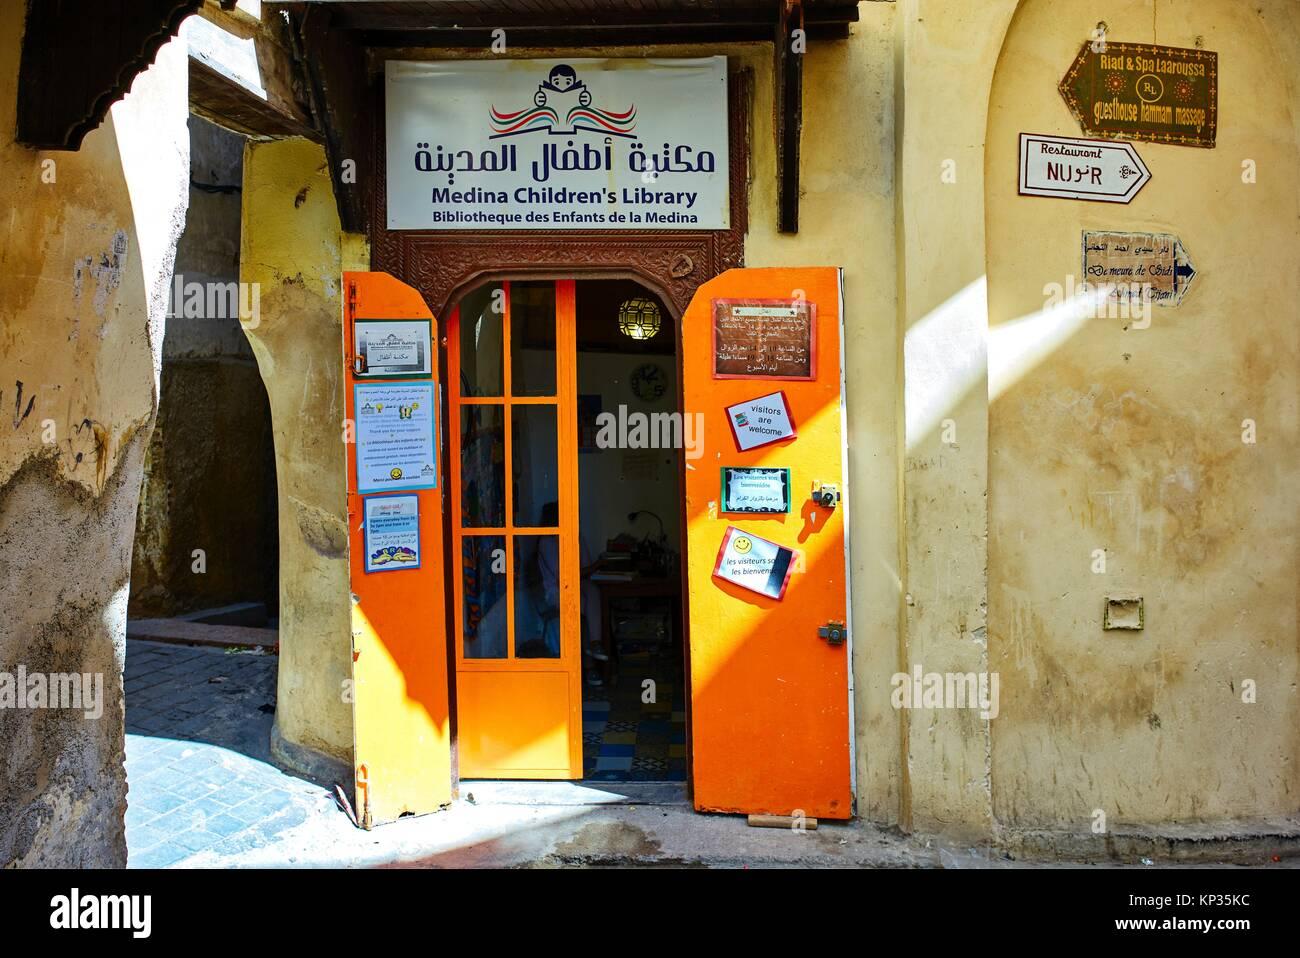 Medina Children´s library in Fez old city, Morocco - Stock Image